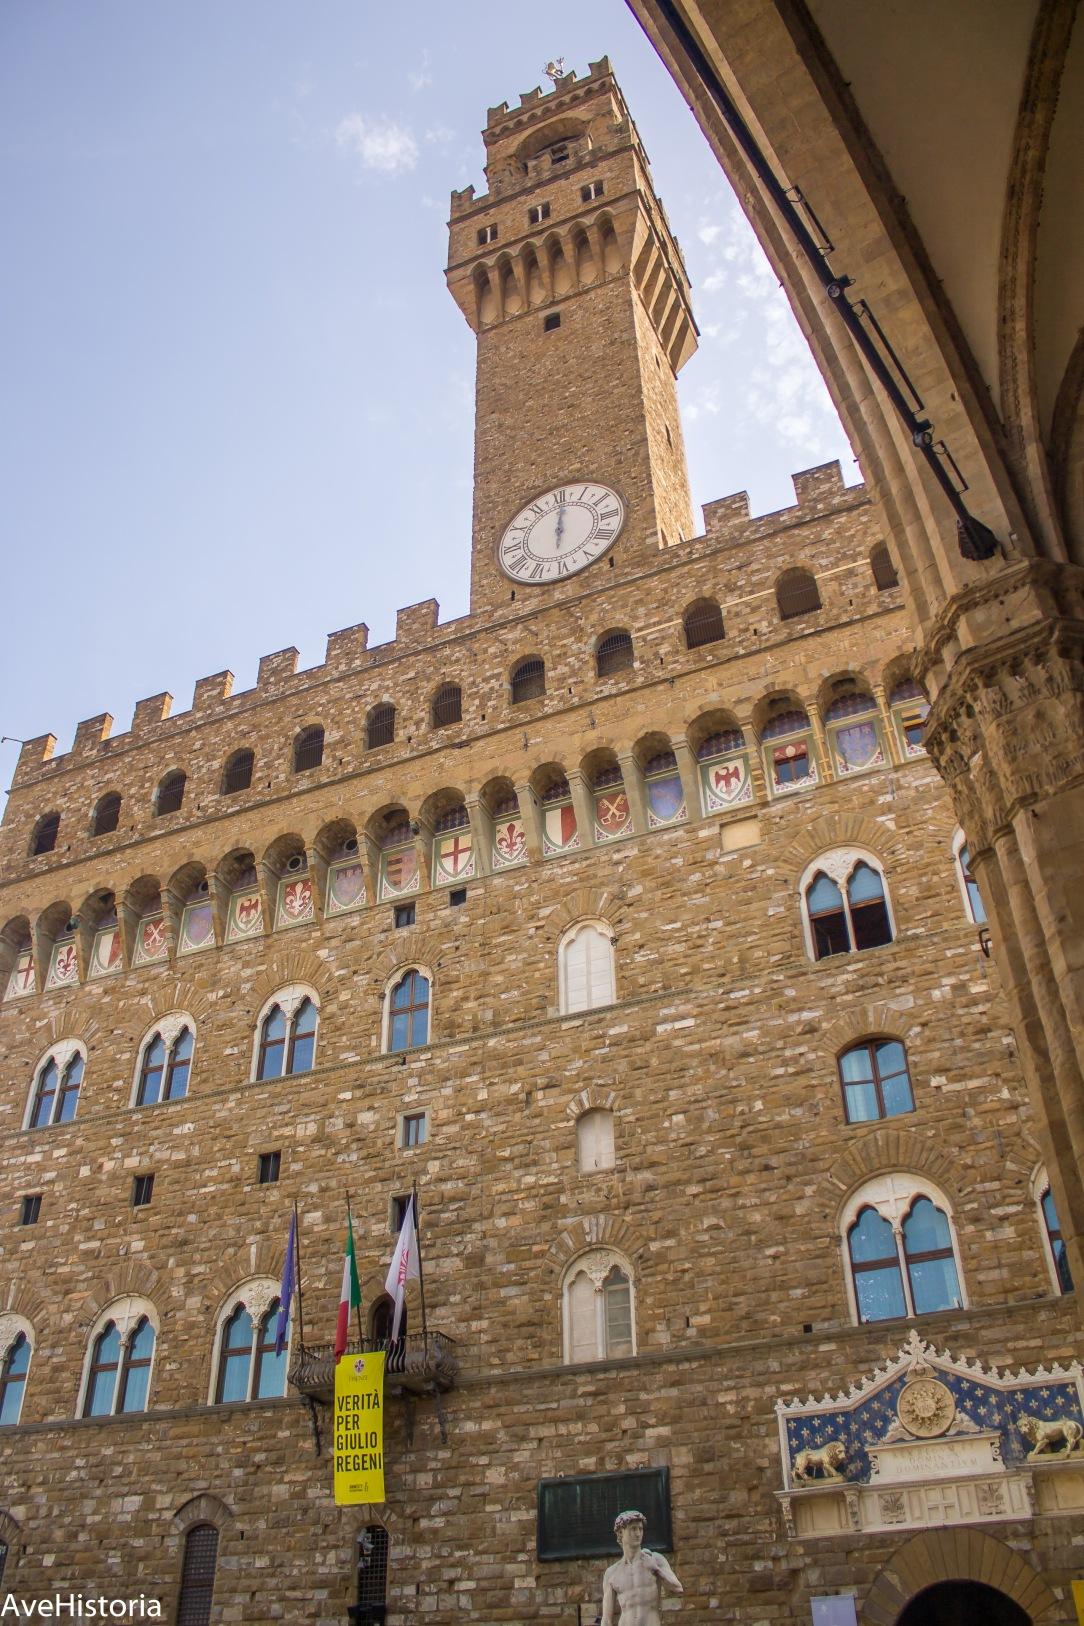 Palazzo Vecchio, Florenta